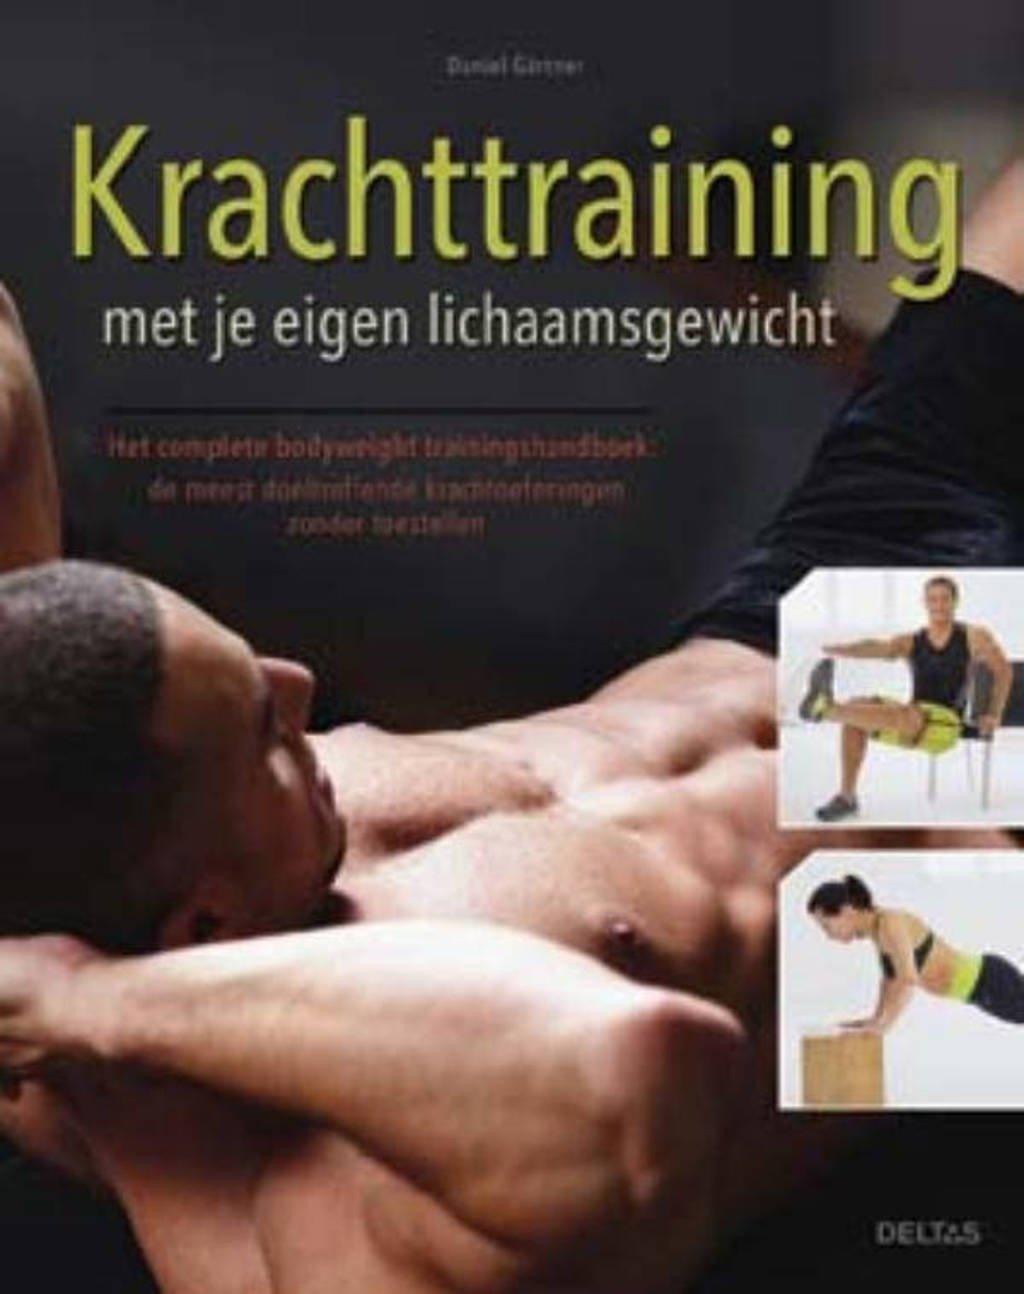 Krachttraining met je eigen lichaamsgewicht - Daniel Gartner